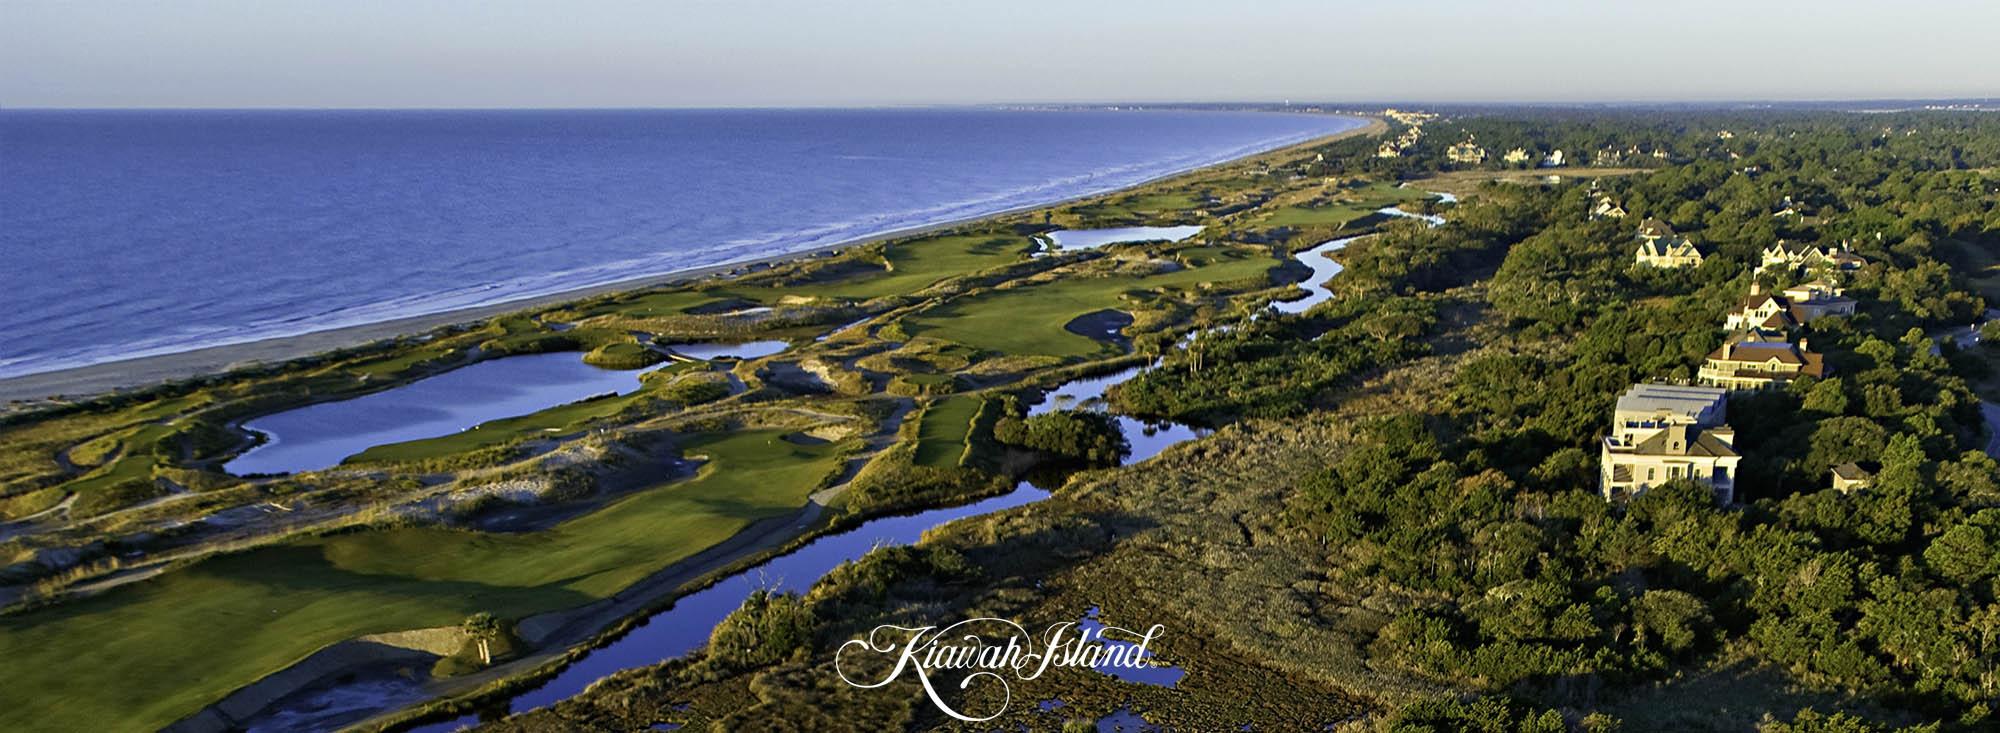 Kiawah Island Real Estate